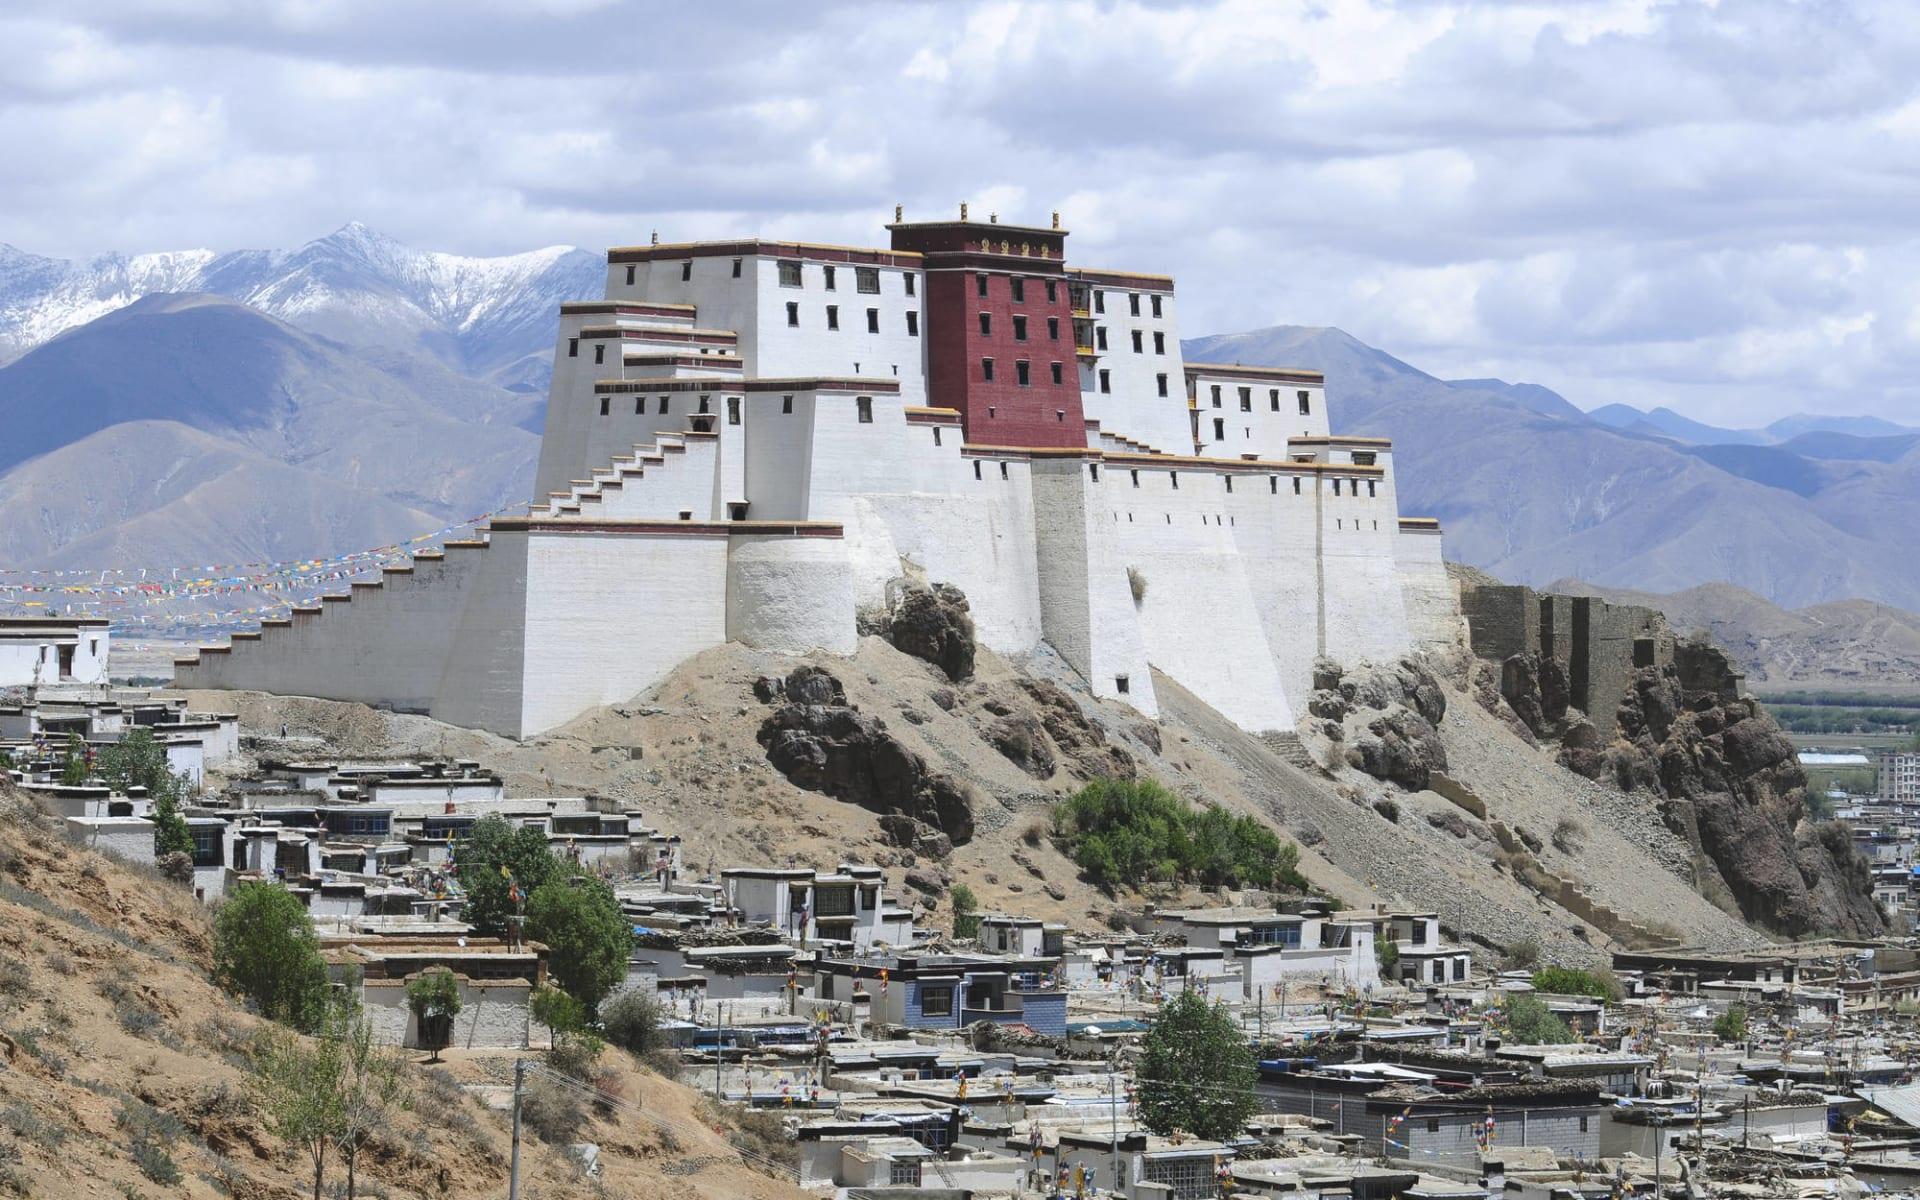 Die Magie des Tibets - Basis & Mt. Everest Verlängerung ab Lhasa: Shigatse Monastery